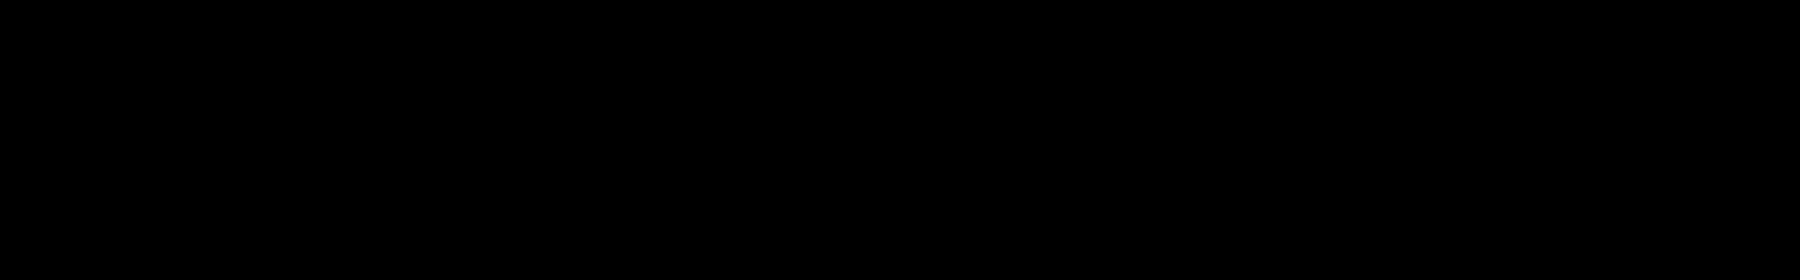 Trumper audio waveform